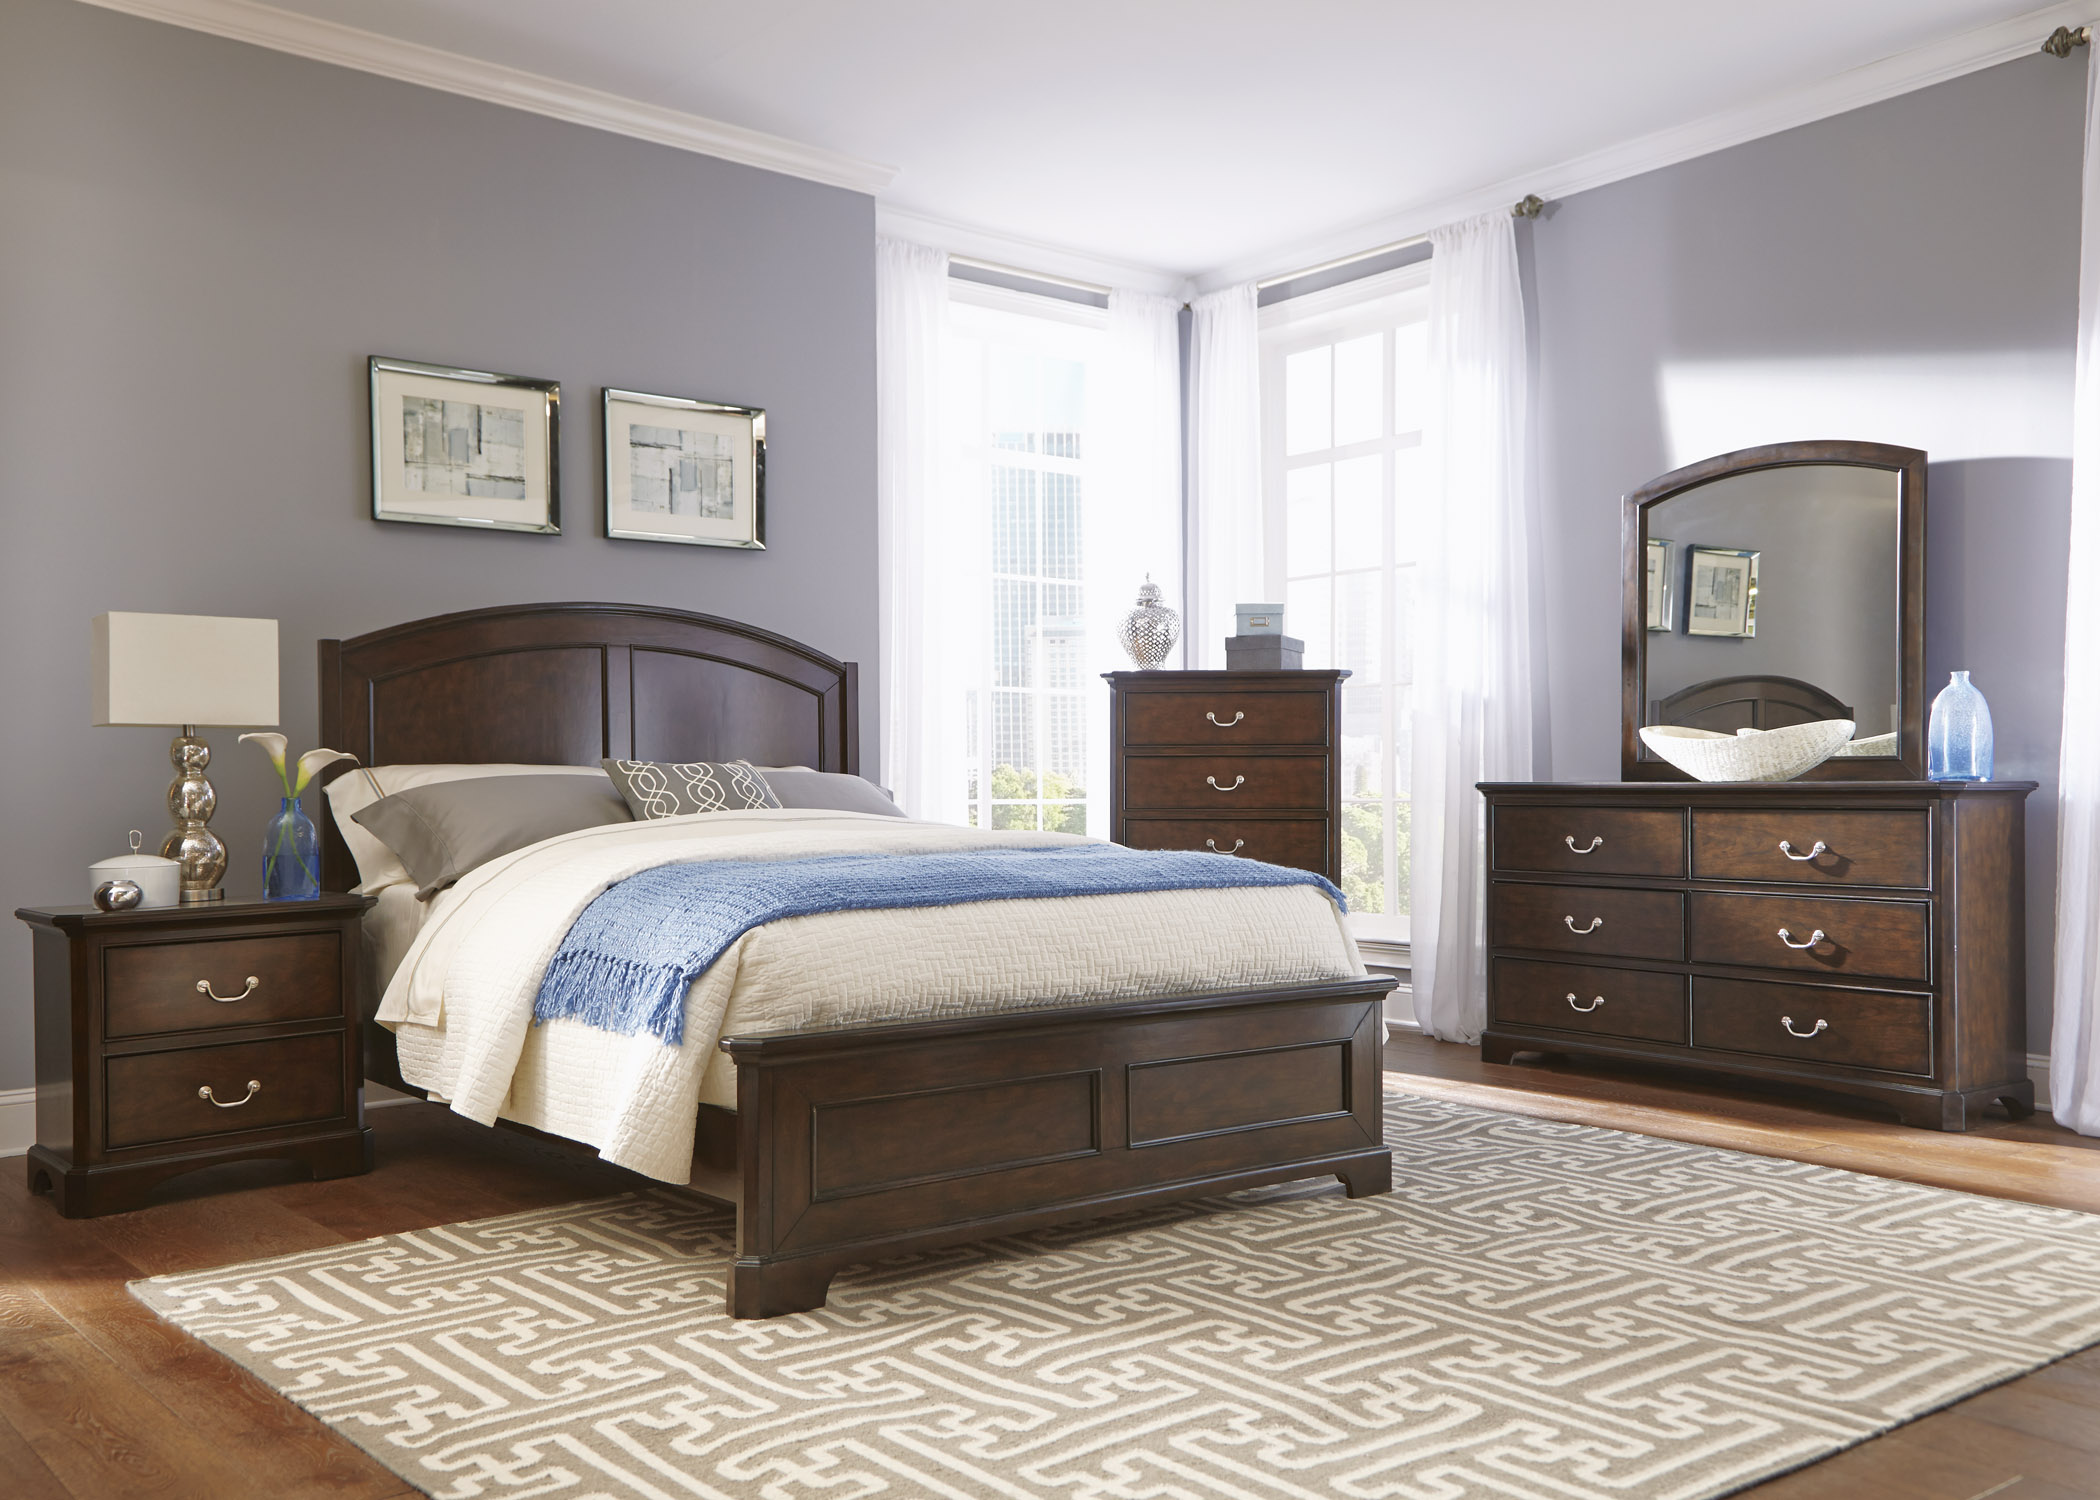 Liberty Furniture Avington Queen Bedroom Group - Item Number: 172-BR-QPBDMCN